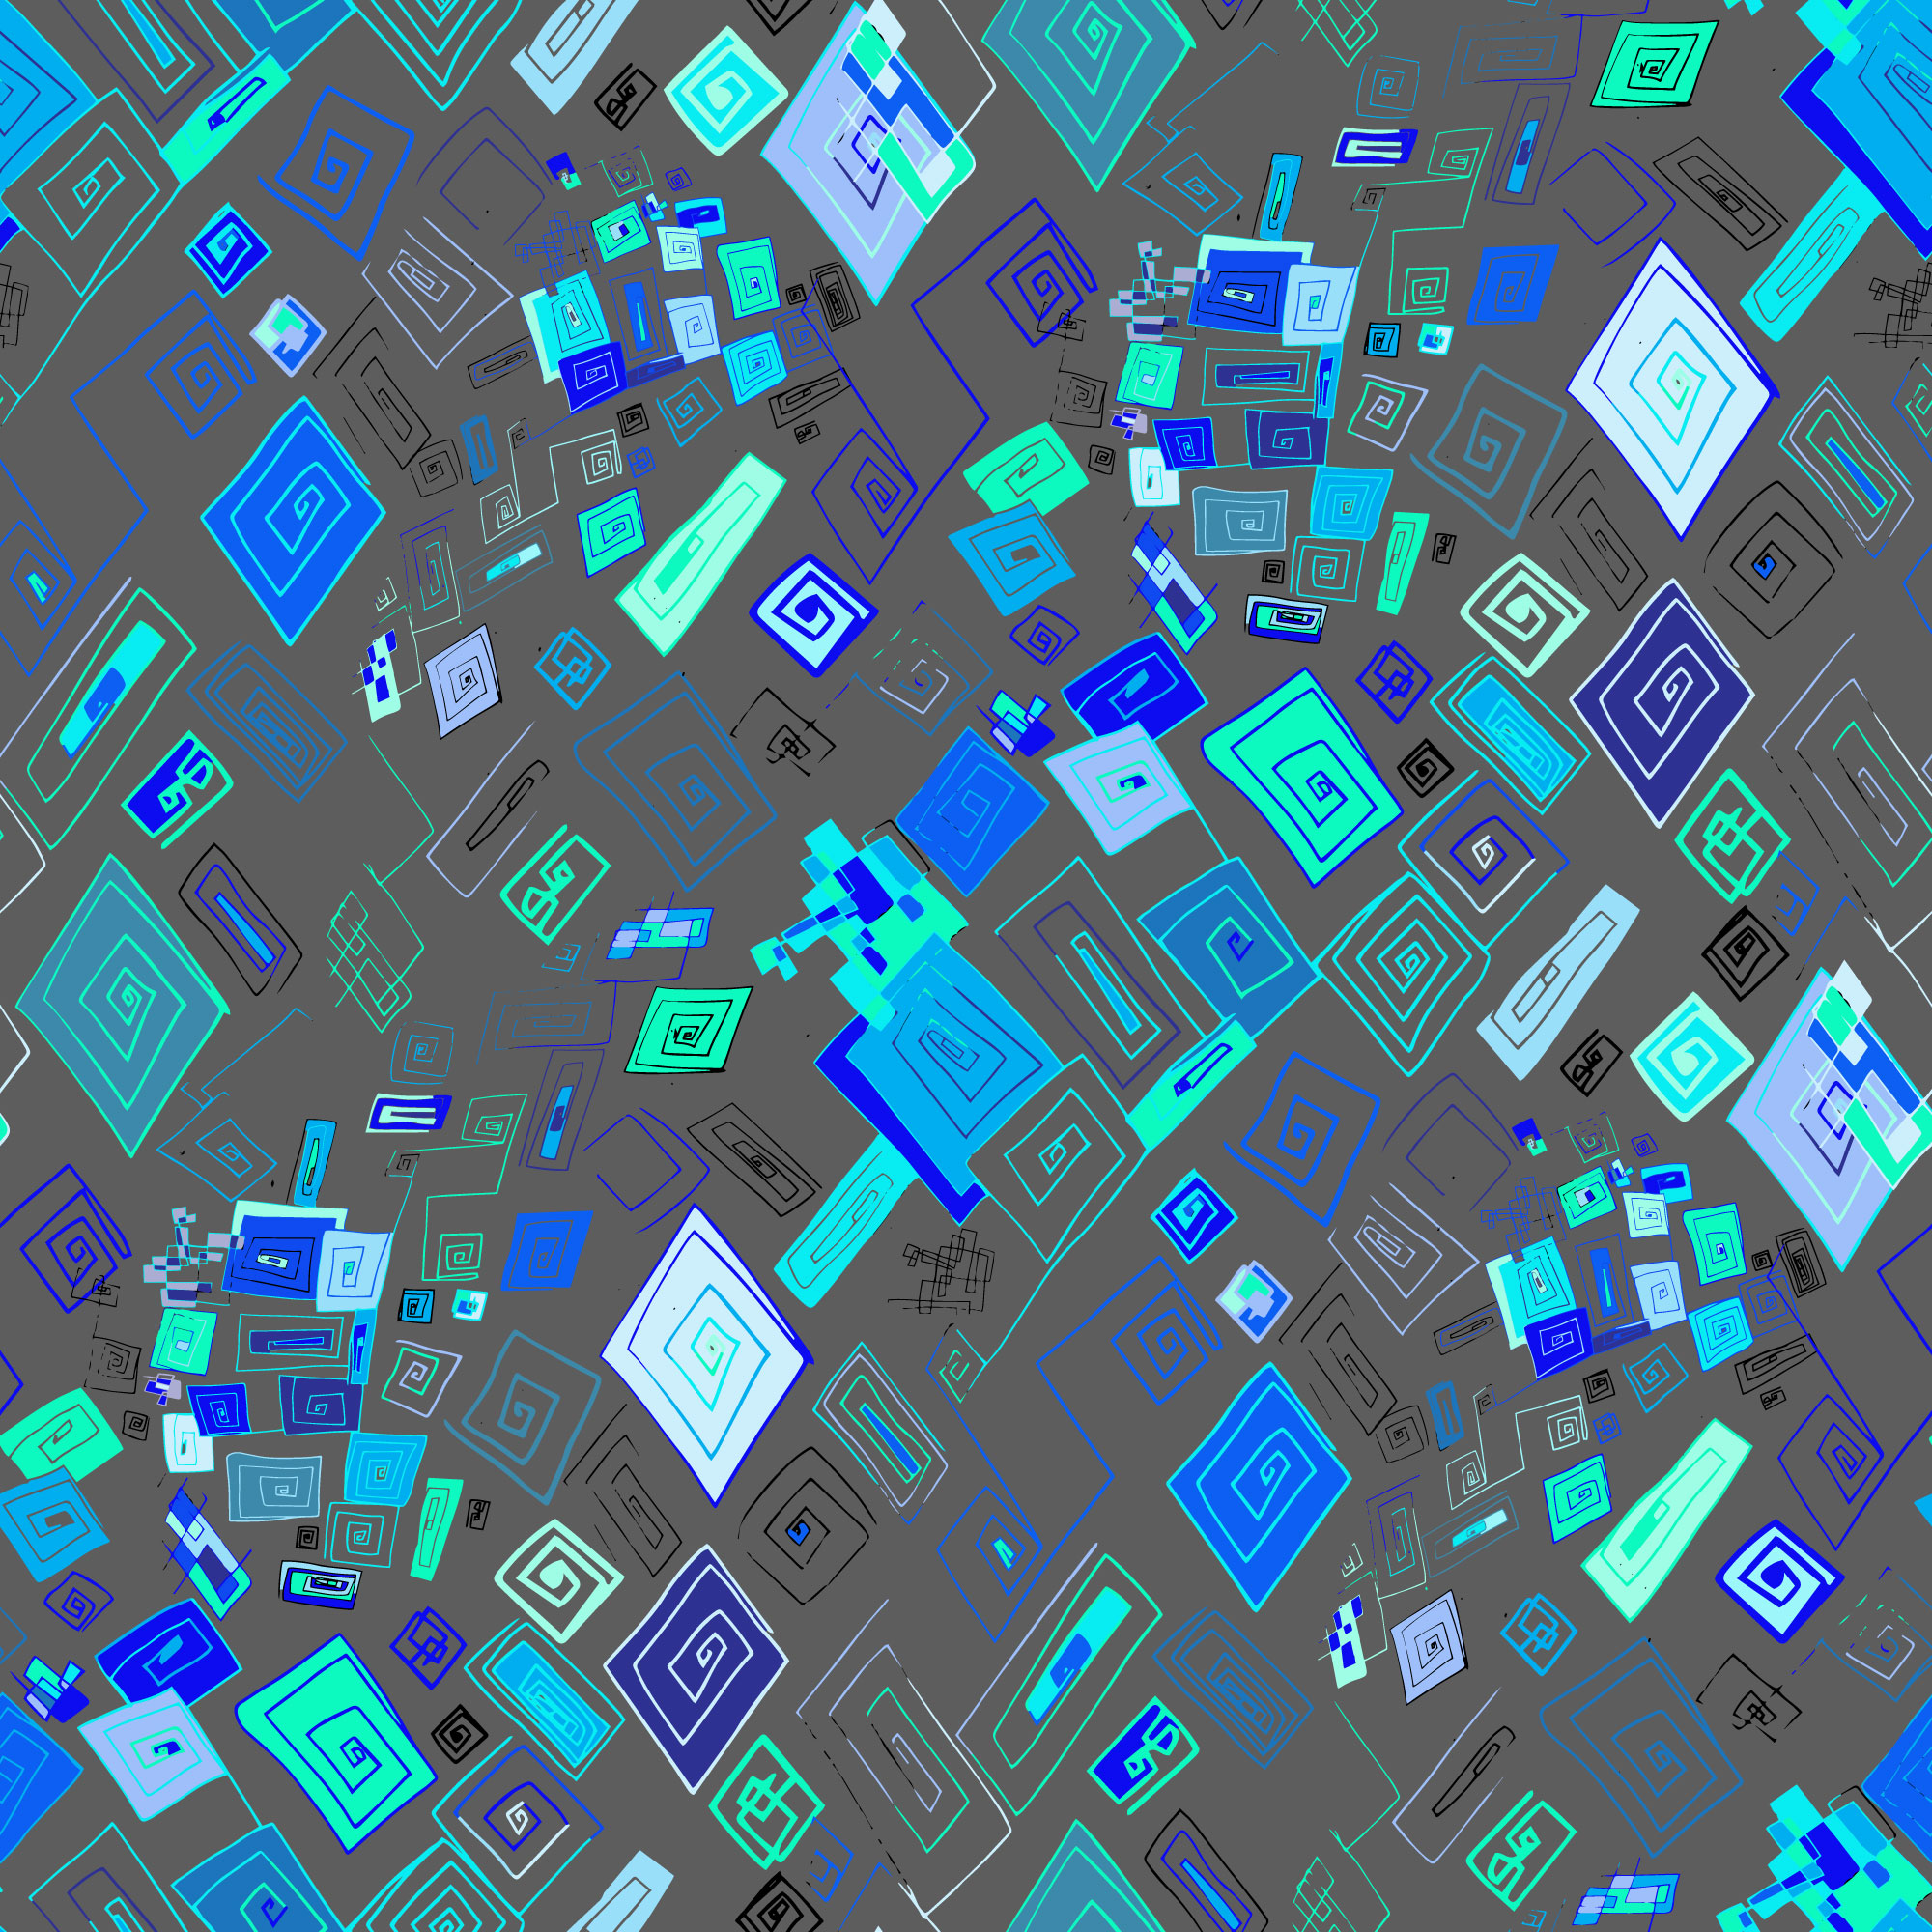 Mike-maze-3-grey-for-webby.jpg